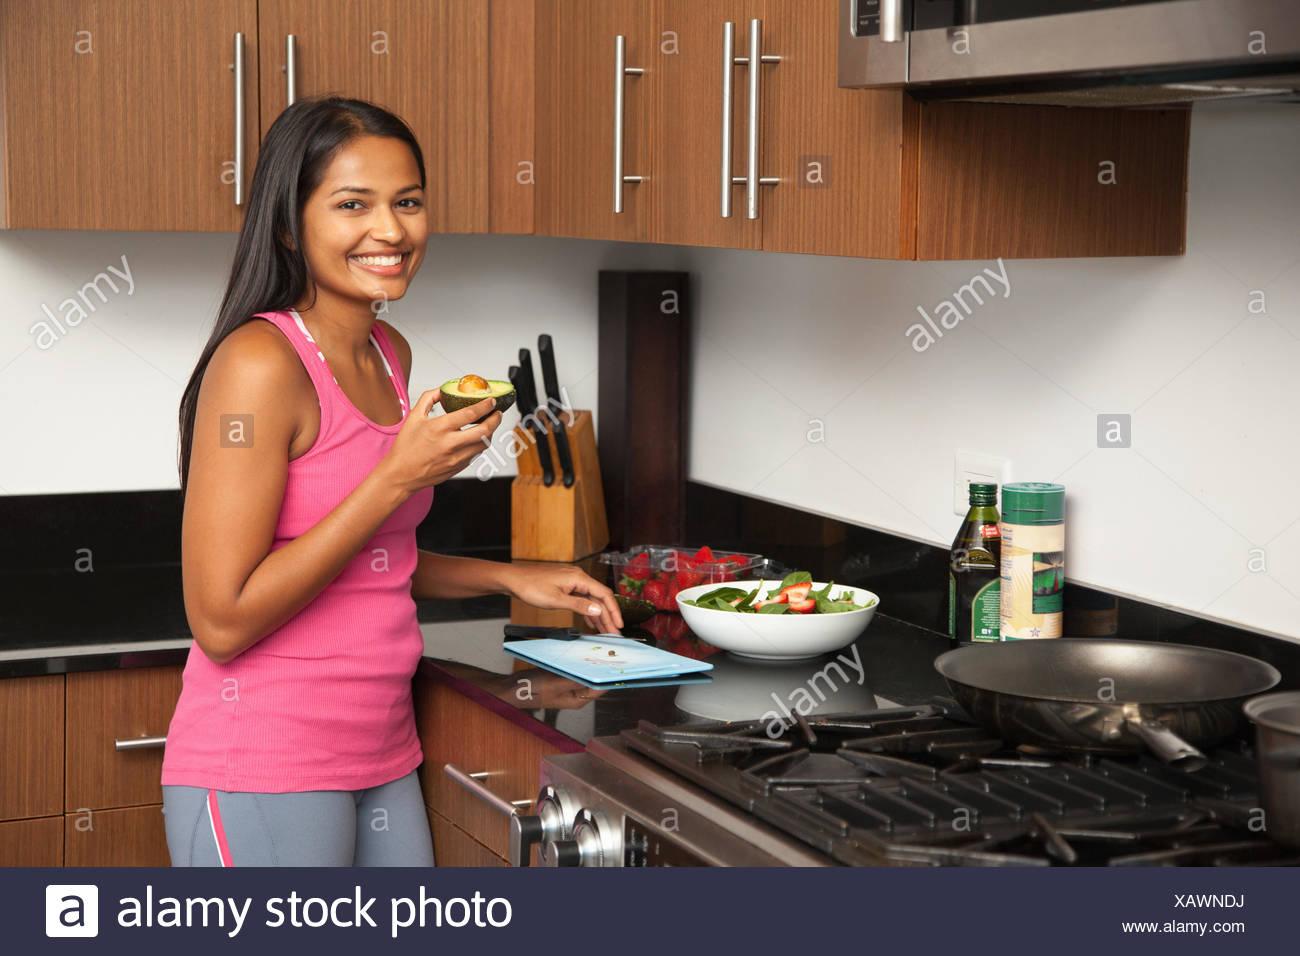 Woman preparing salad in kitchen Photo Stock